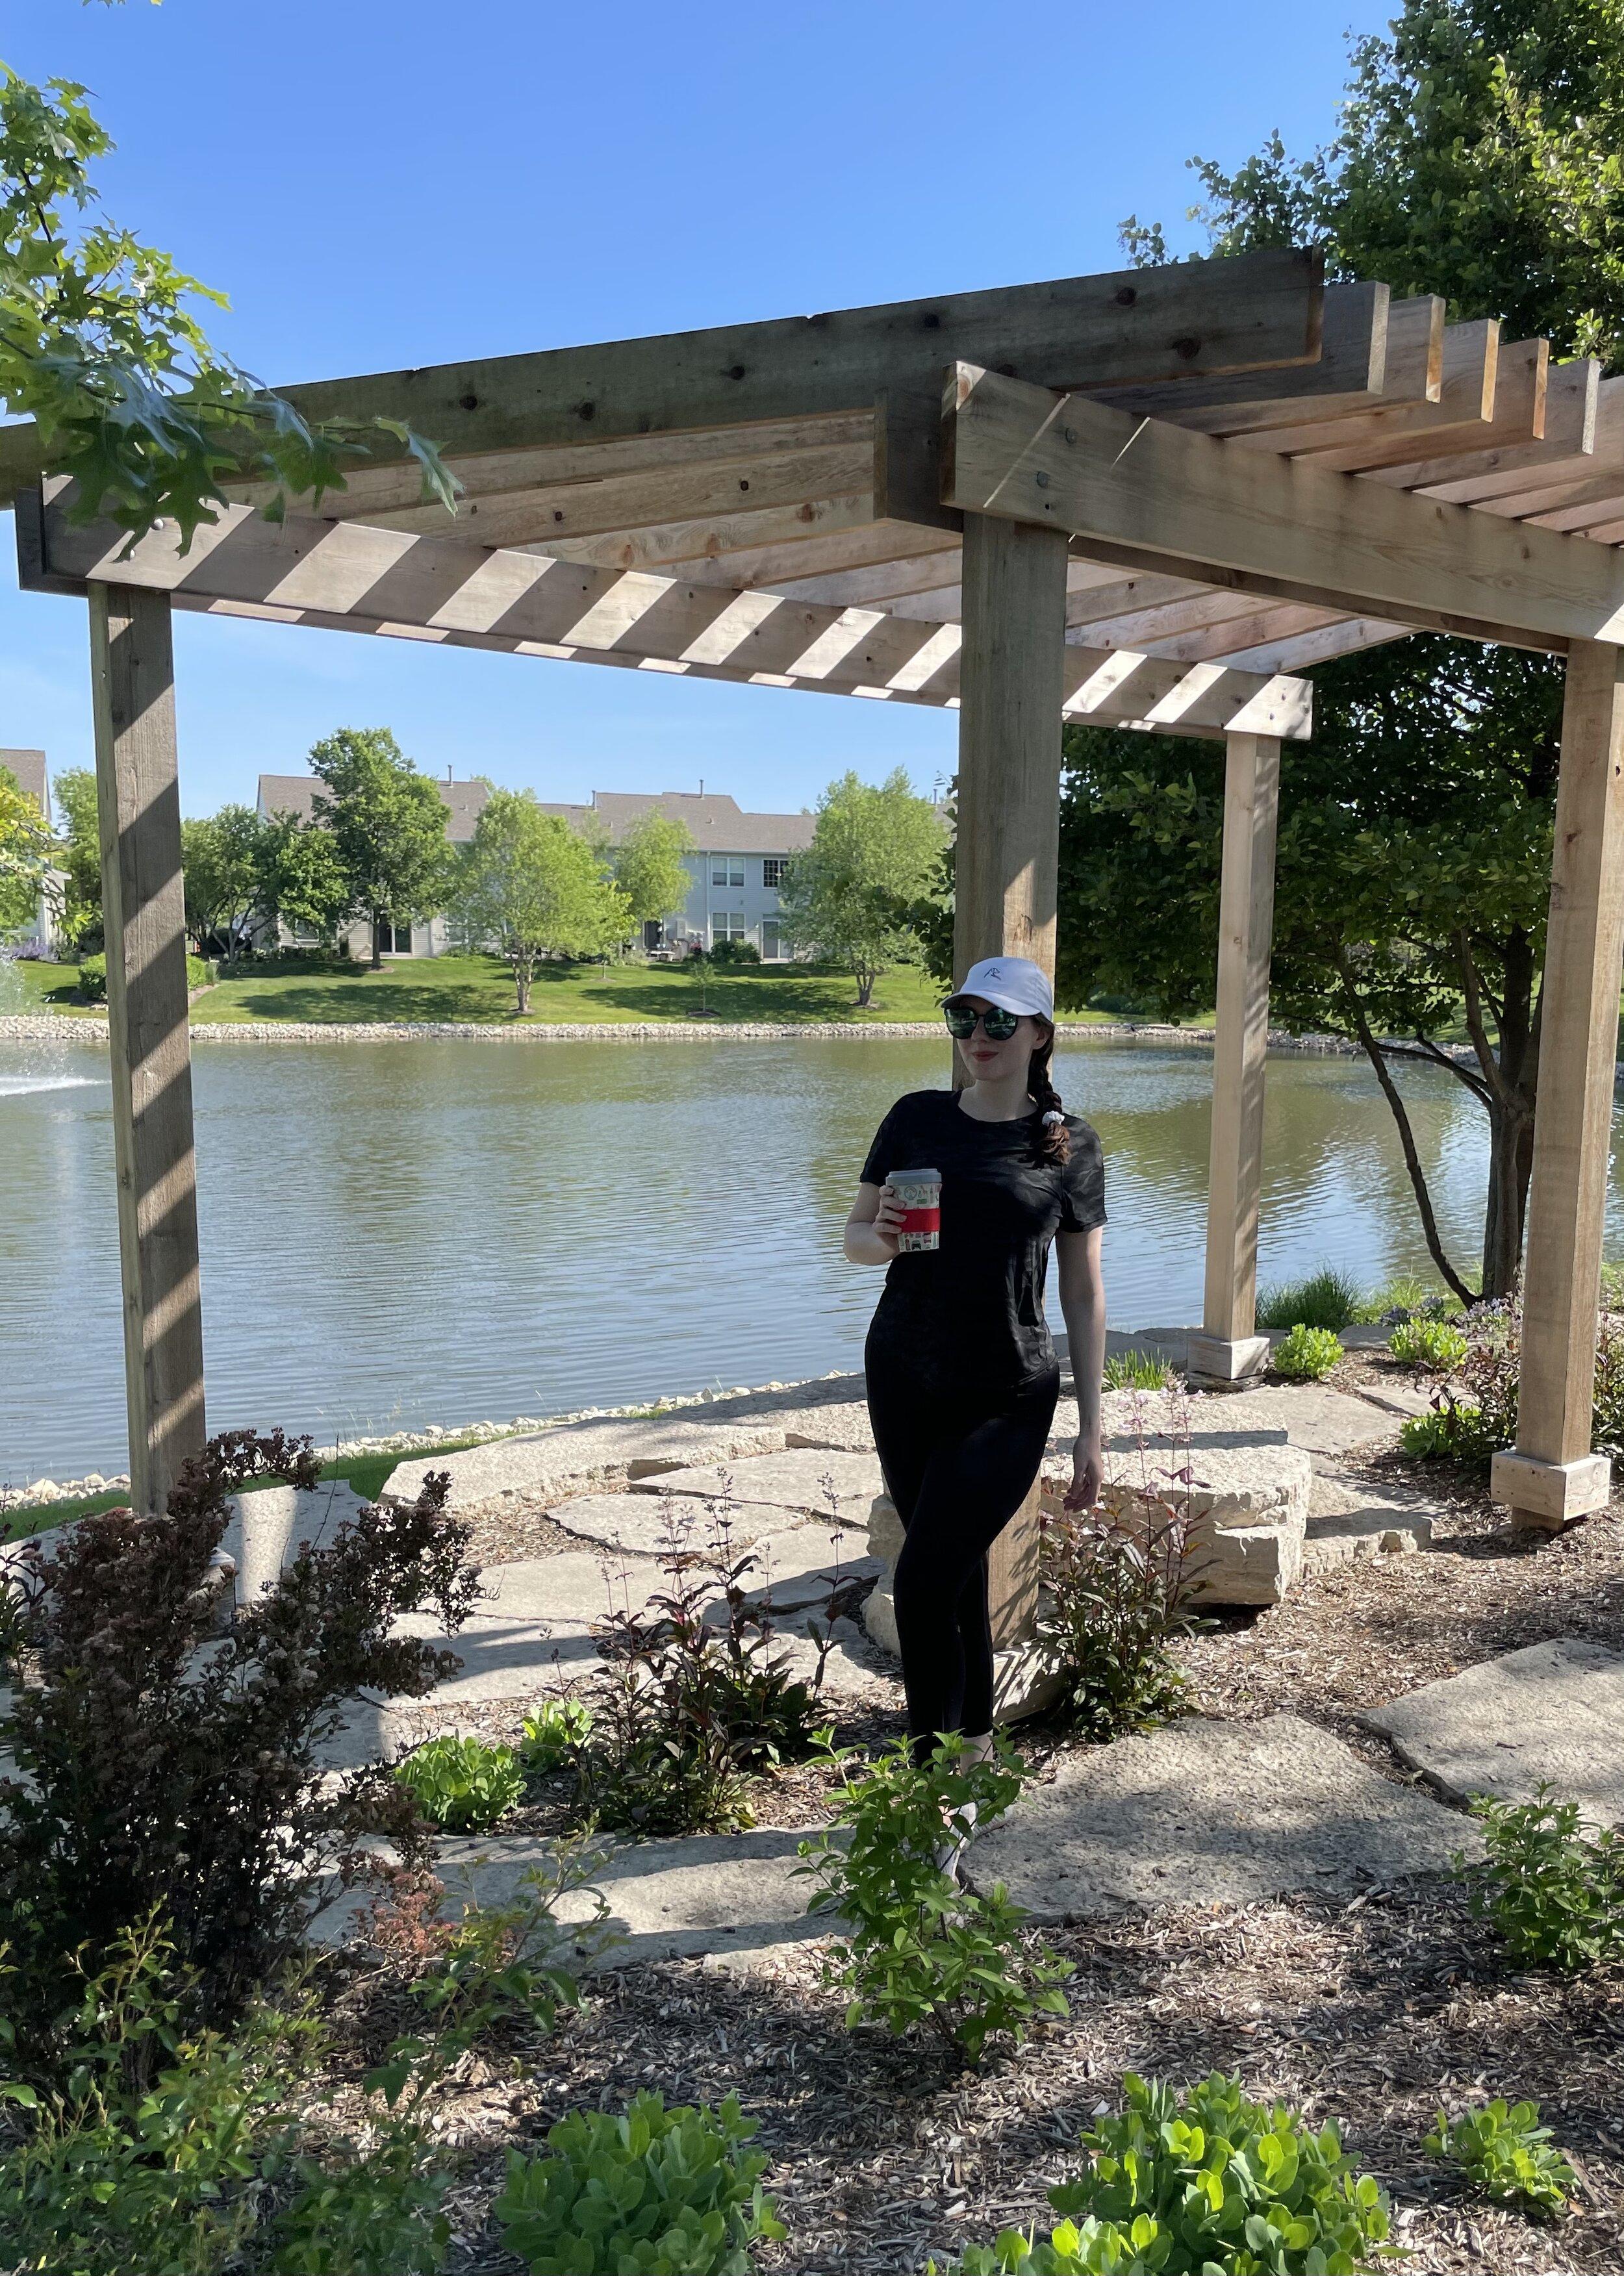 Sunday Spotlights 15: Virtual Book Club & Hot Summer Days